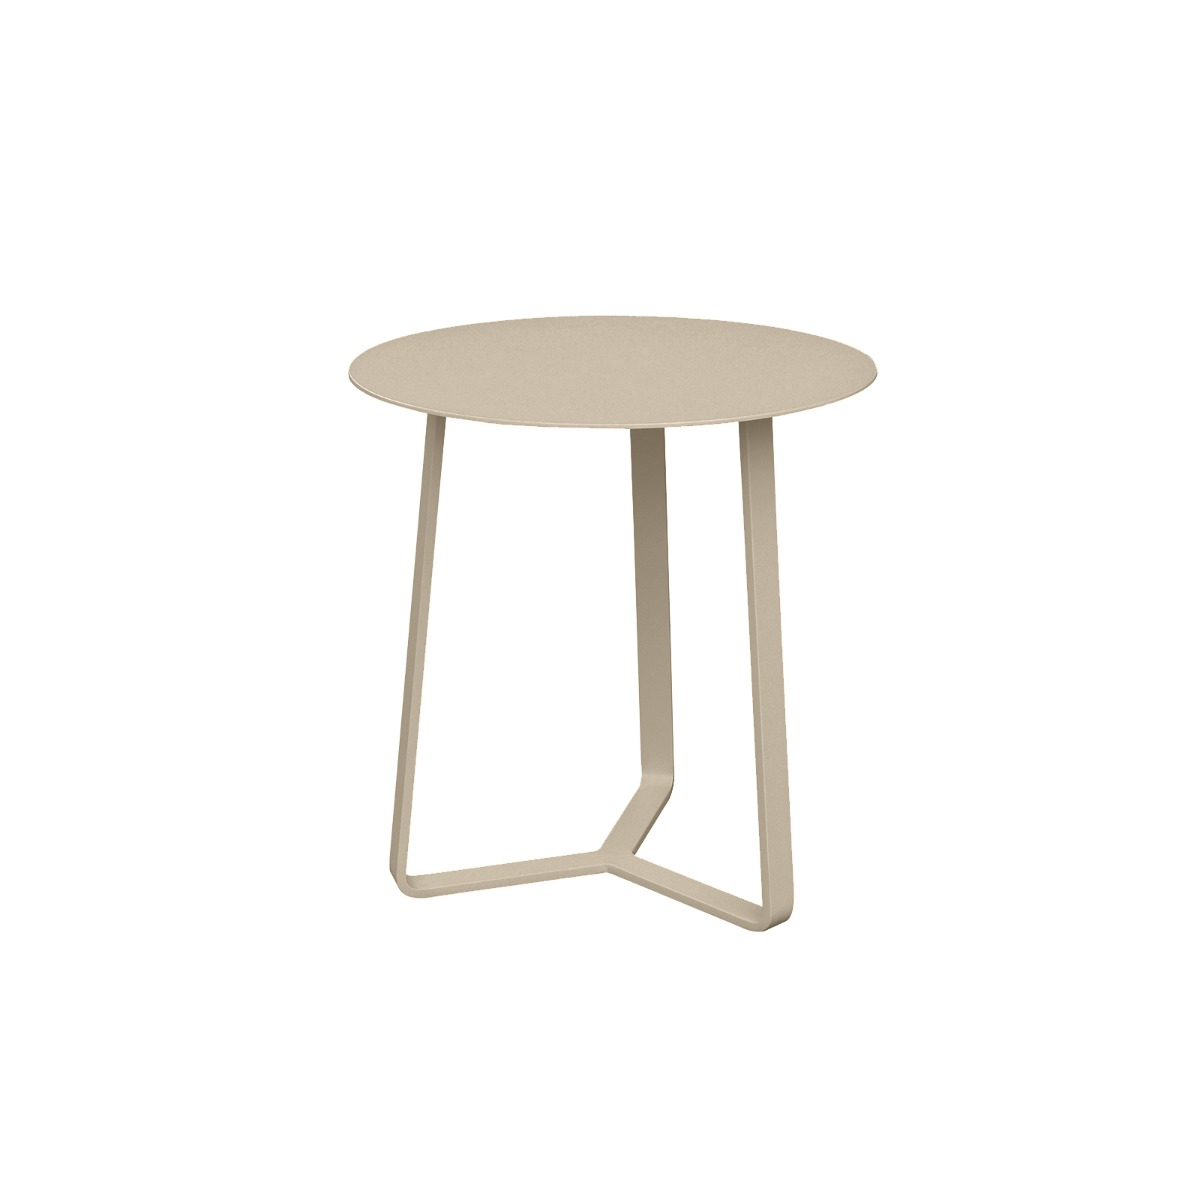 Apollo Aluminium Large Side Table in Light Taupe